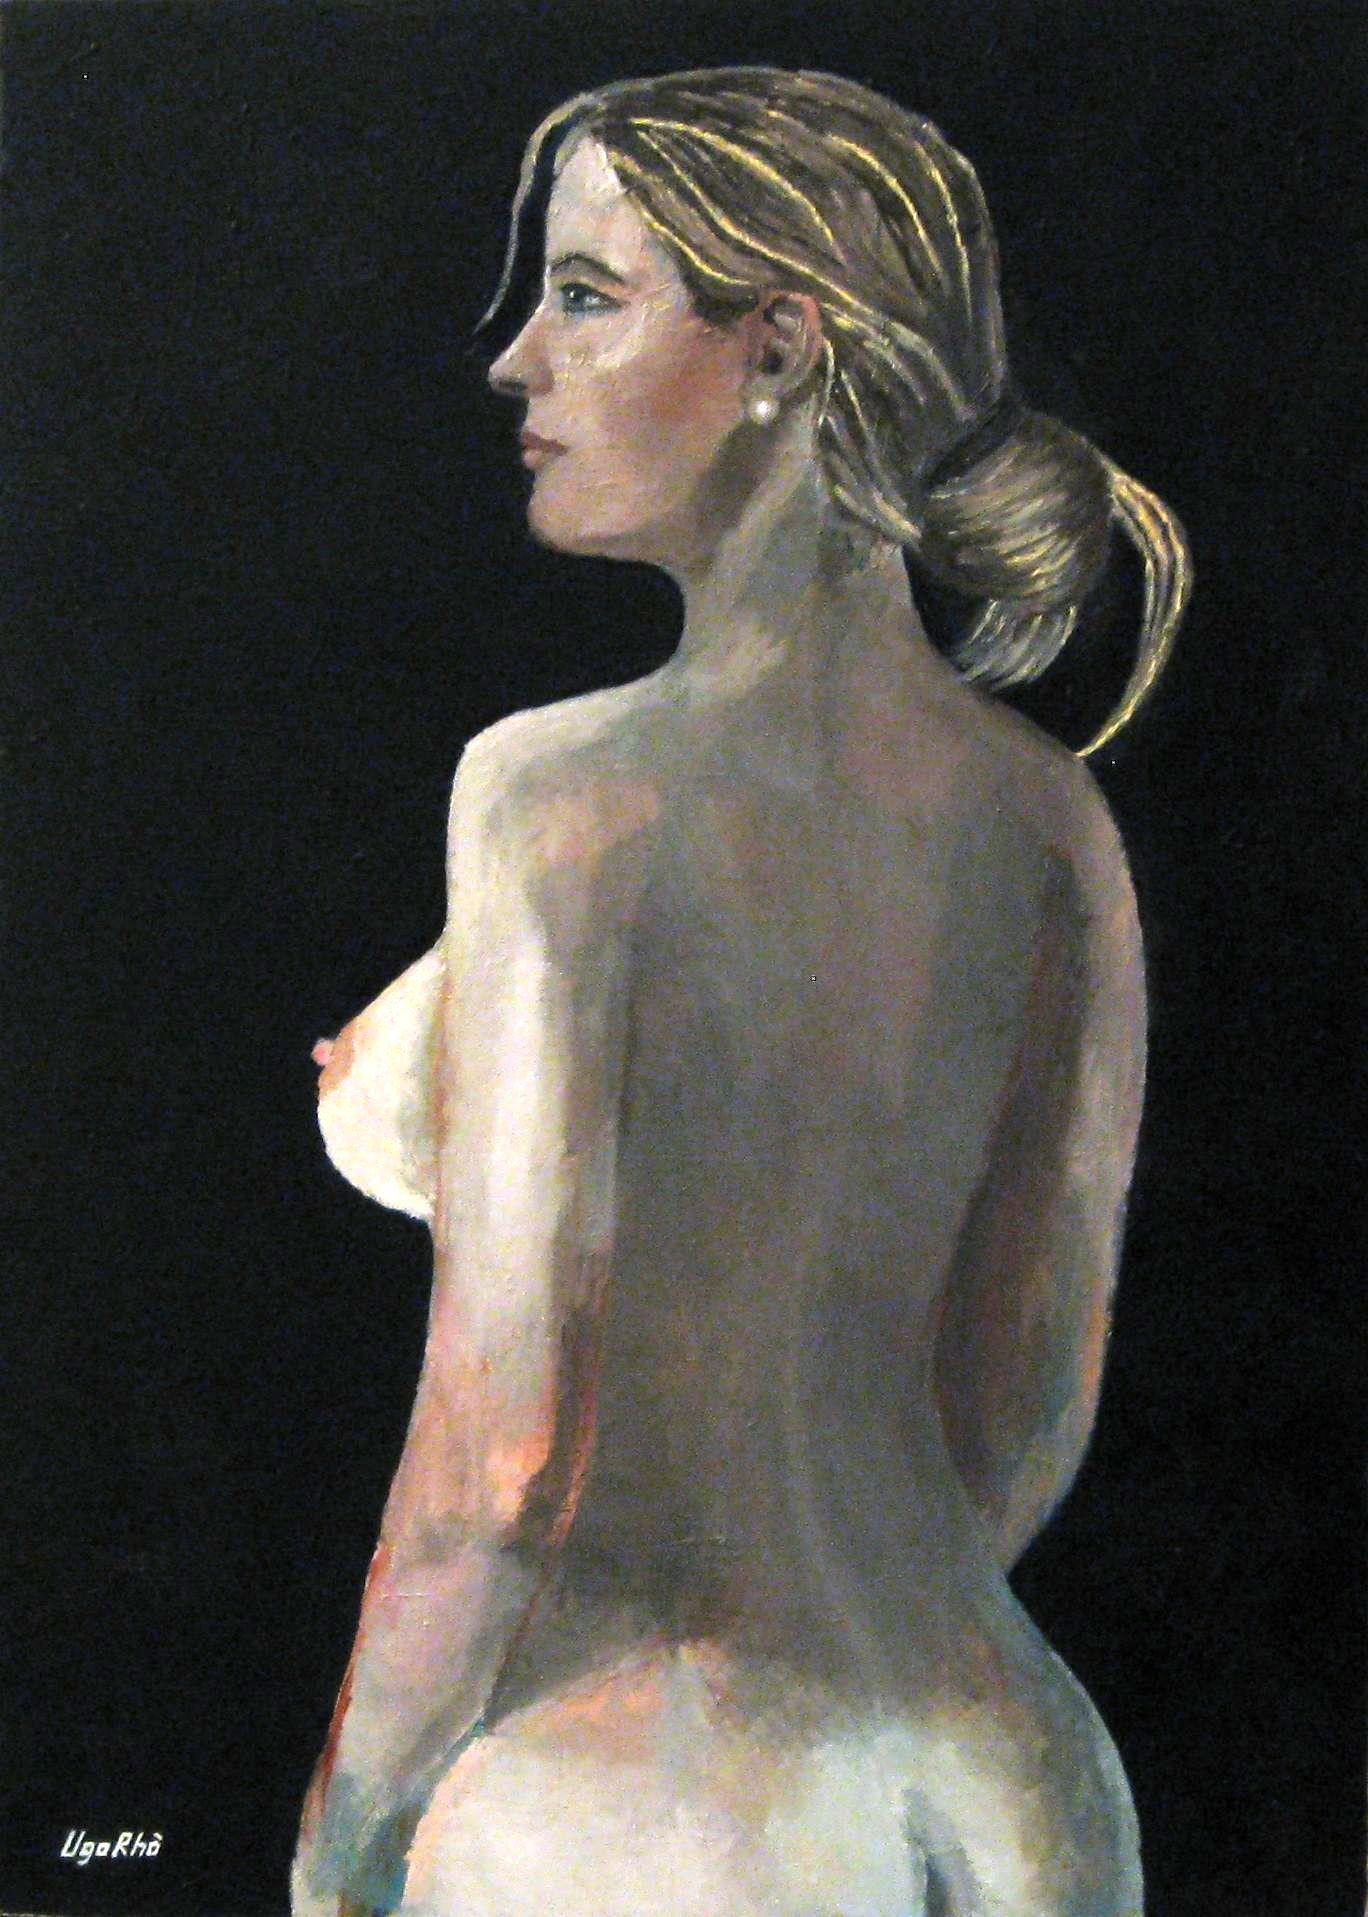 Painting Nude Oil (Ugo Rho - Roma Italy)